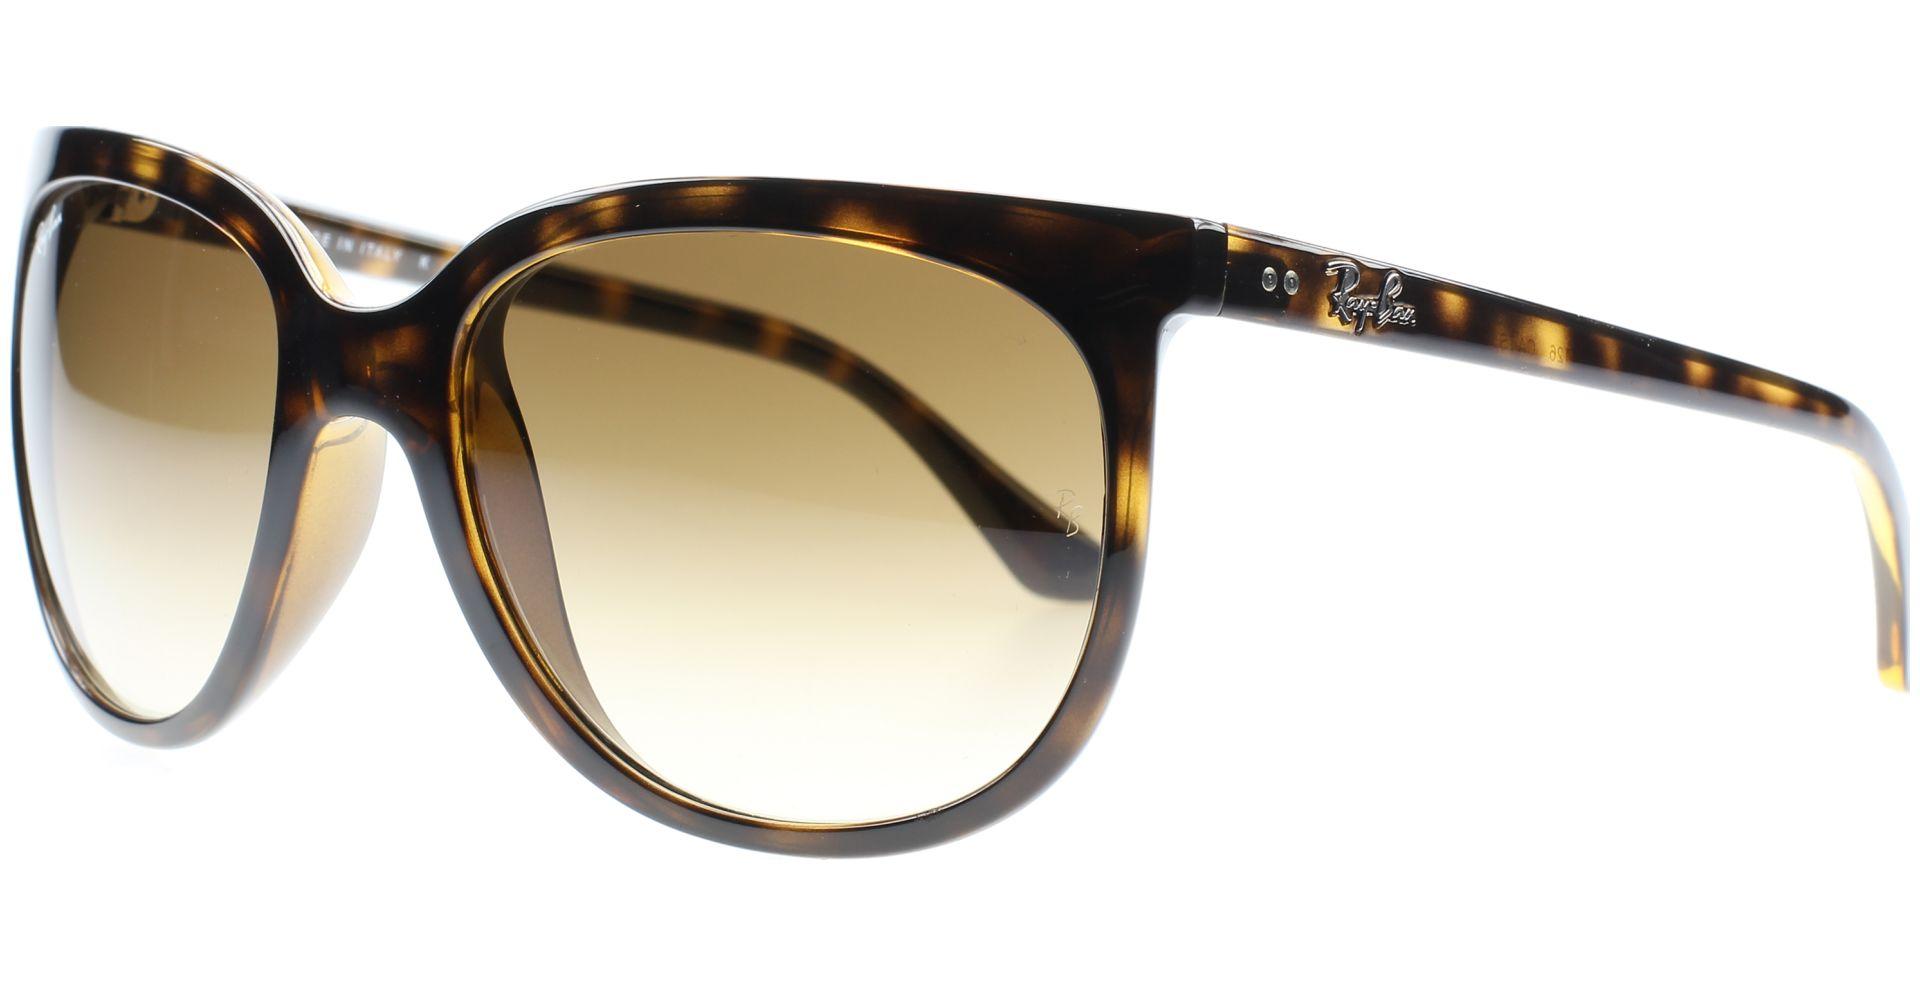 Ray-Ban CATS 1000 Sonnenbrille Helles Havana 710/51 57mm 44LsbC